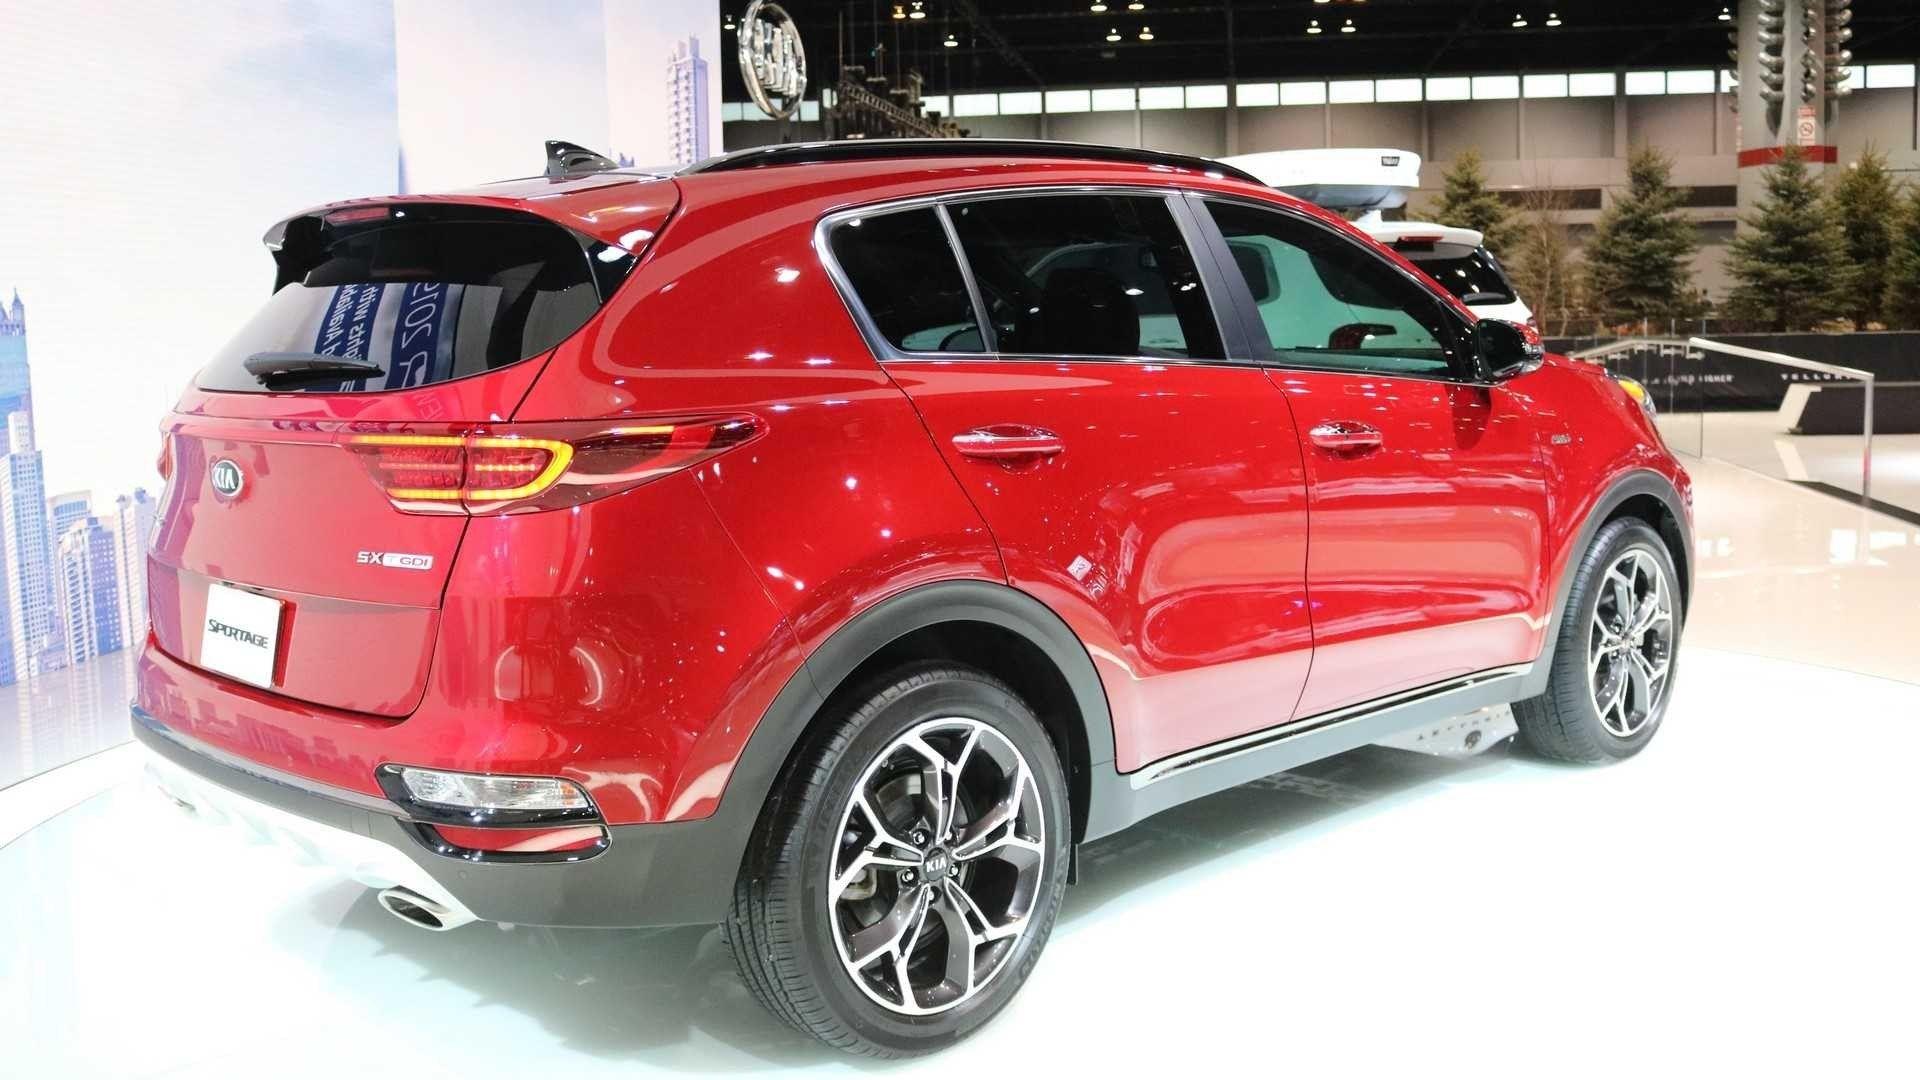 2020 Kia Vehicles New Review Vehicles, Car, Perfect image